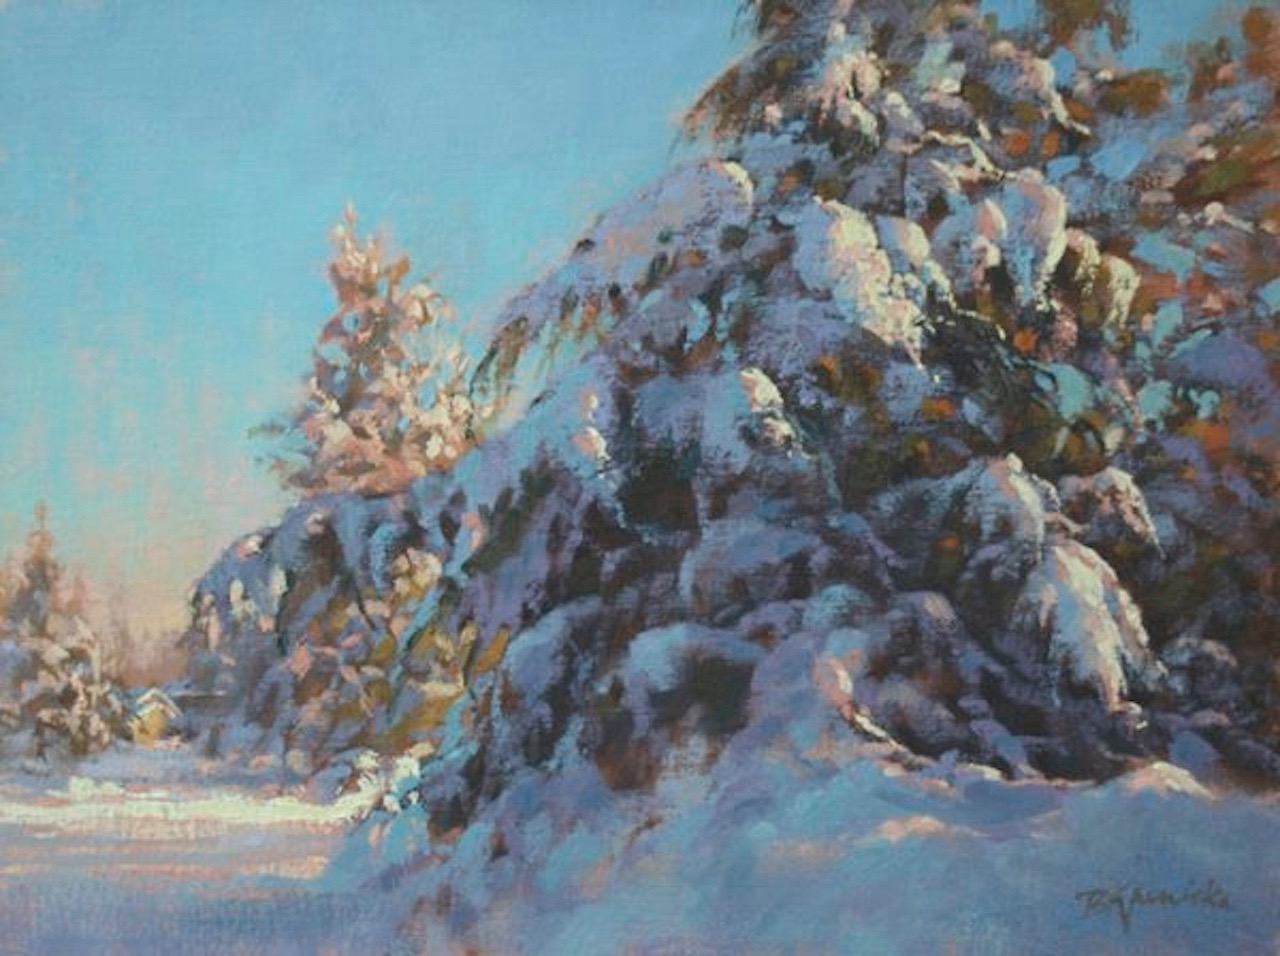 BJaenicke-Hiding Behind the Snowy Juniper-12x16-oil.jpg